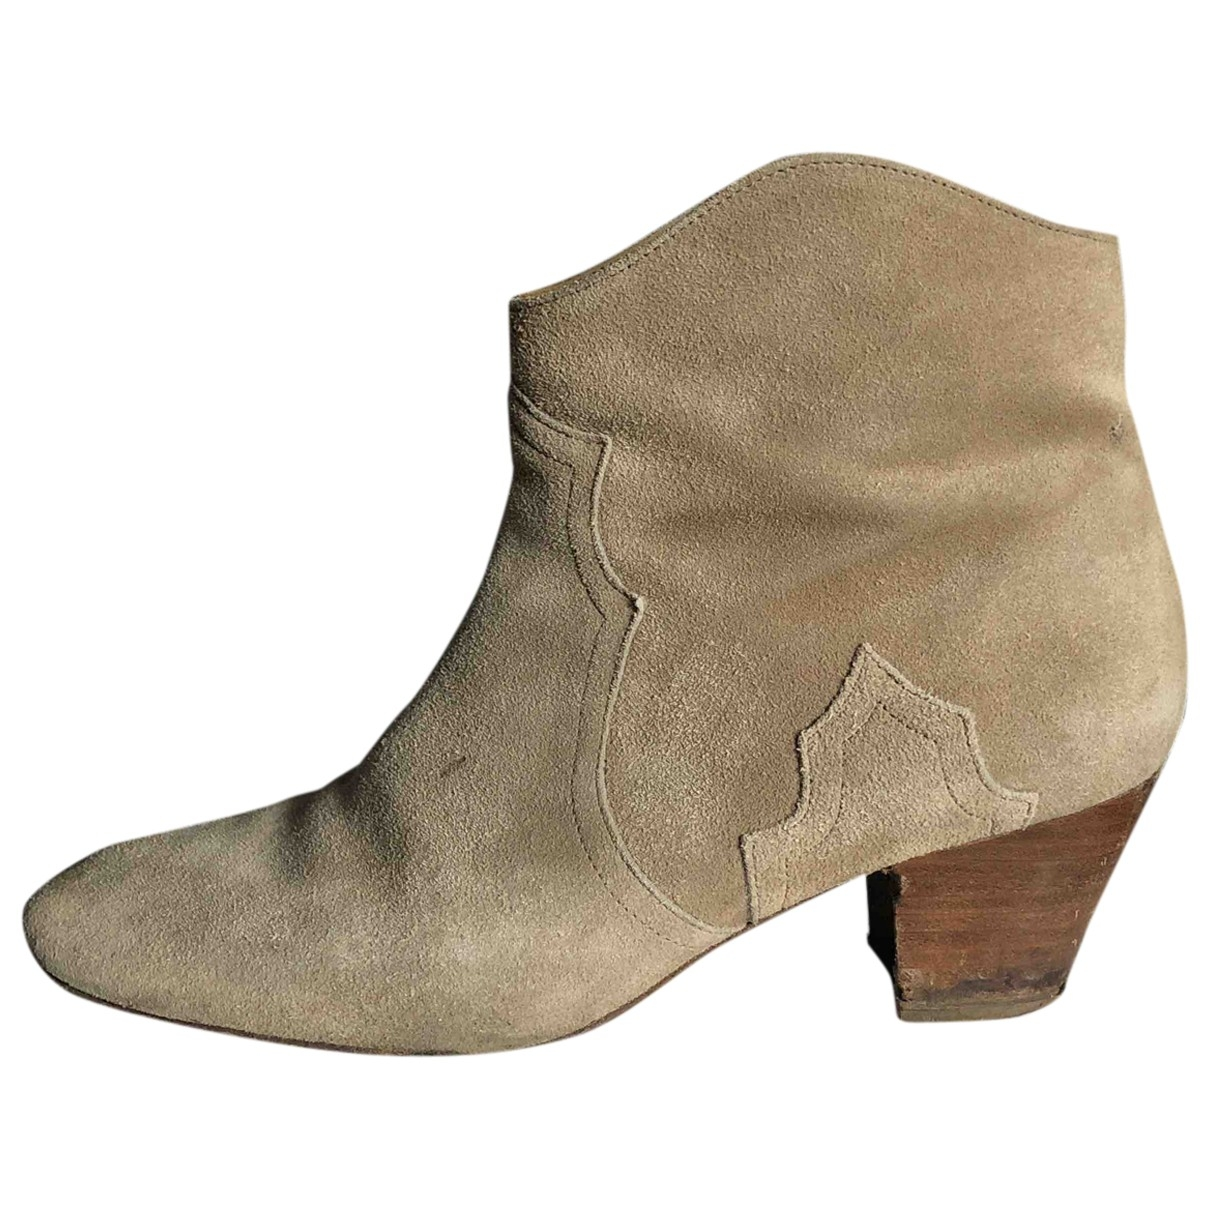 Isabel Marant Dicker Beige Suede Ankle boots for Women 41 EU